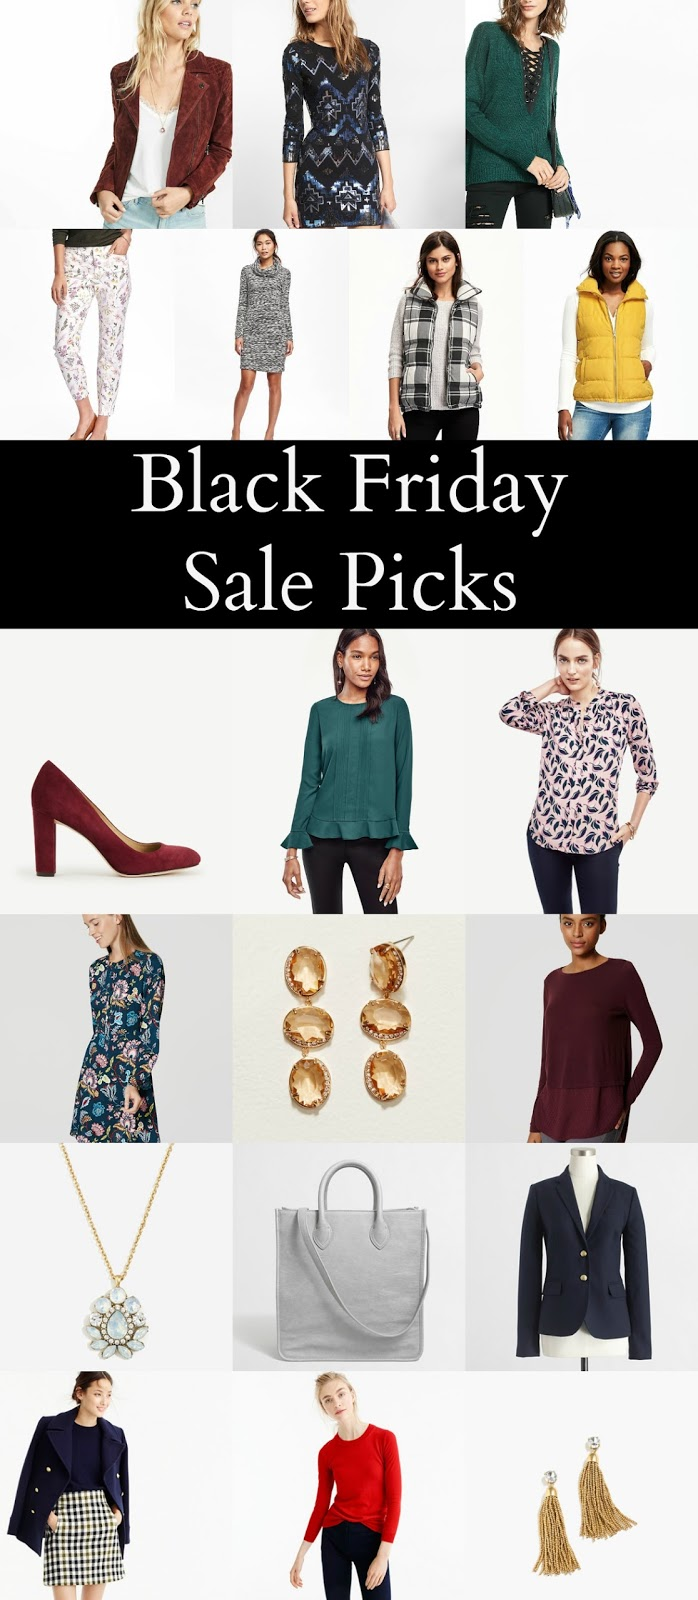 Black Friday Sale Picks 2016